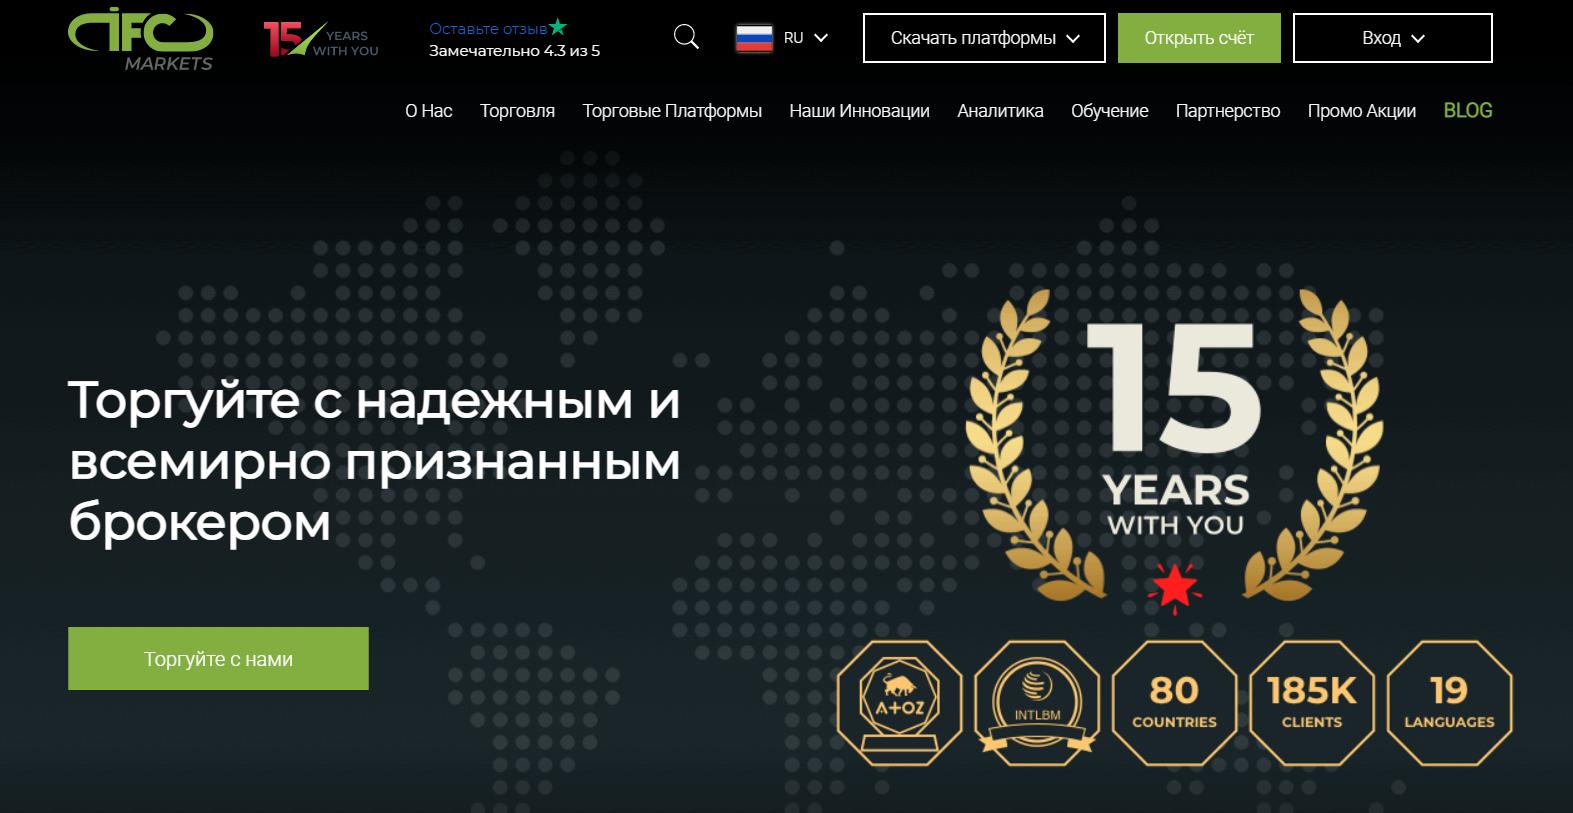 ifc markets официальный сайт